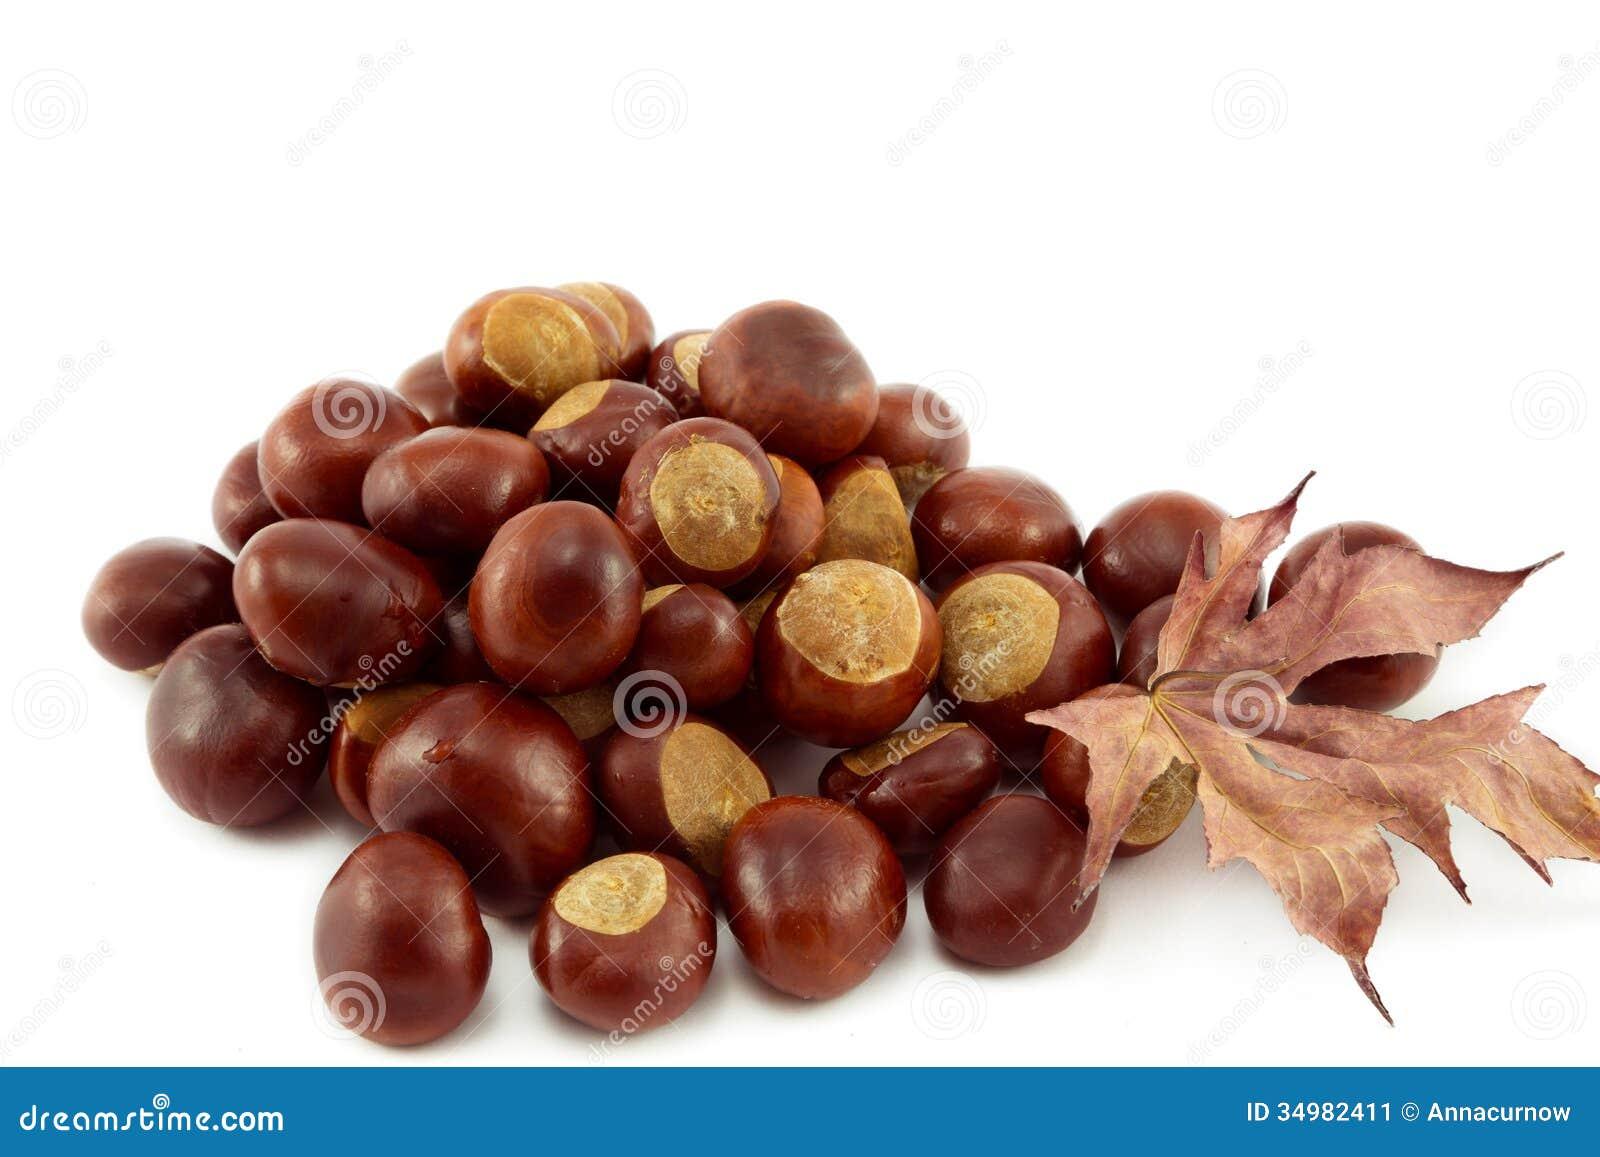 Horse chestnut stock image image 34982411 for The chestnut